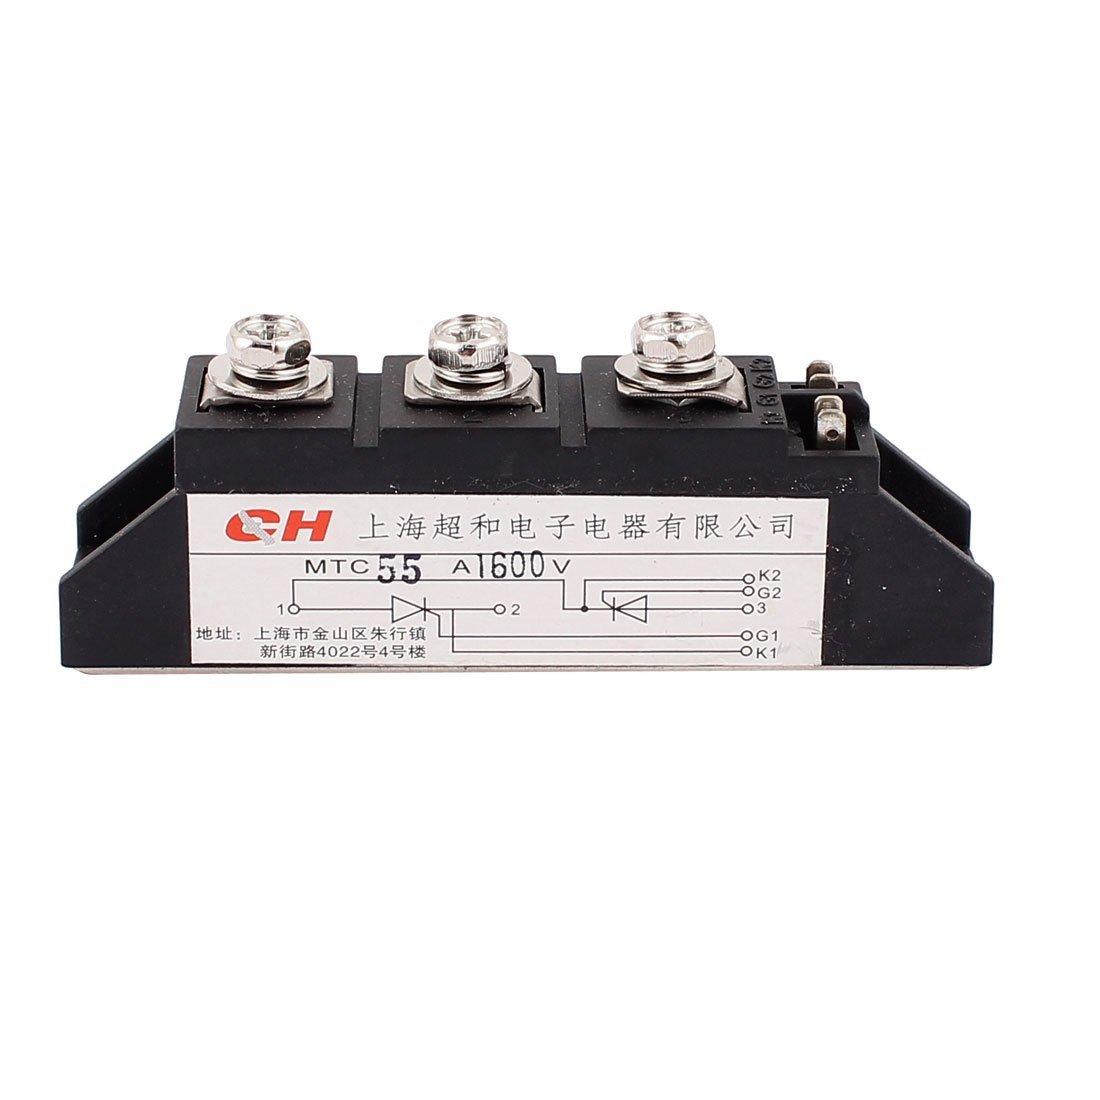 eDealMax MTC-55A Silicon contrôle MTC Thyristor redresseur Module 55A 1600V